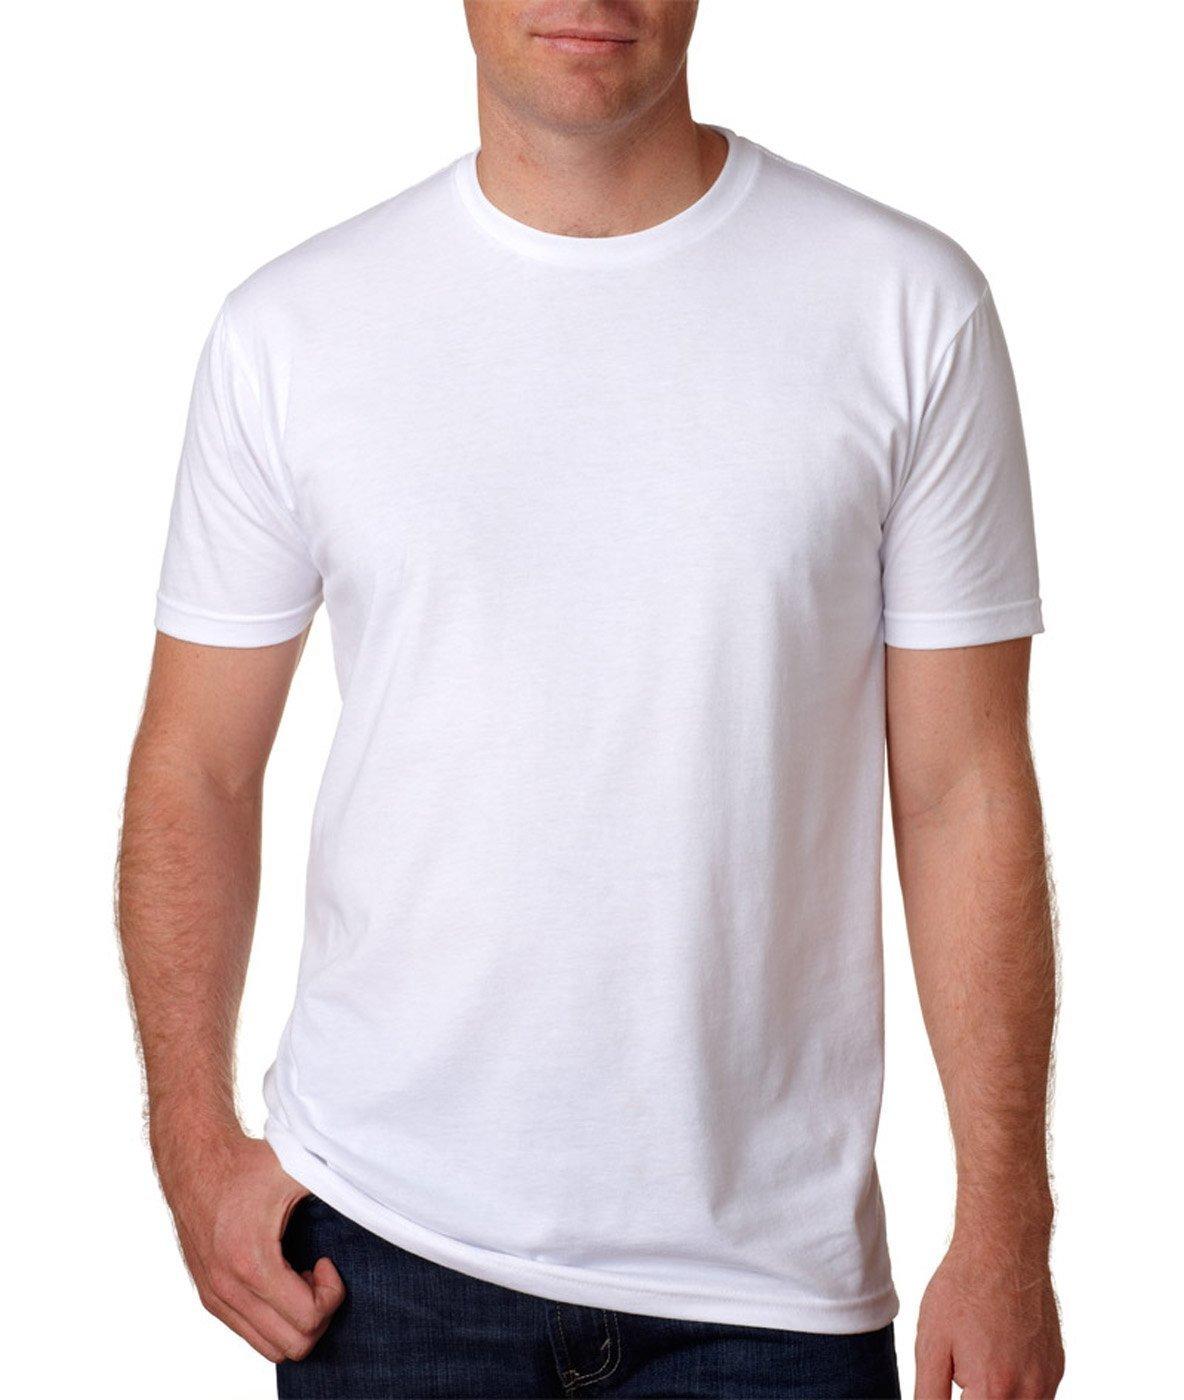 Next Level Apparel メンズ CVC クルーネック ジャージ Tシャツ B07F6V2FN3 X-Large 5-white_shirts 5-white_shirts X-Large